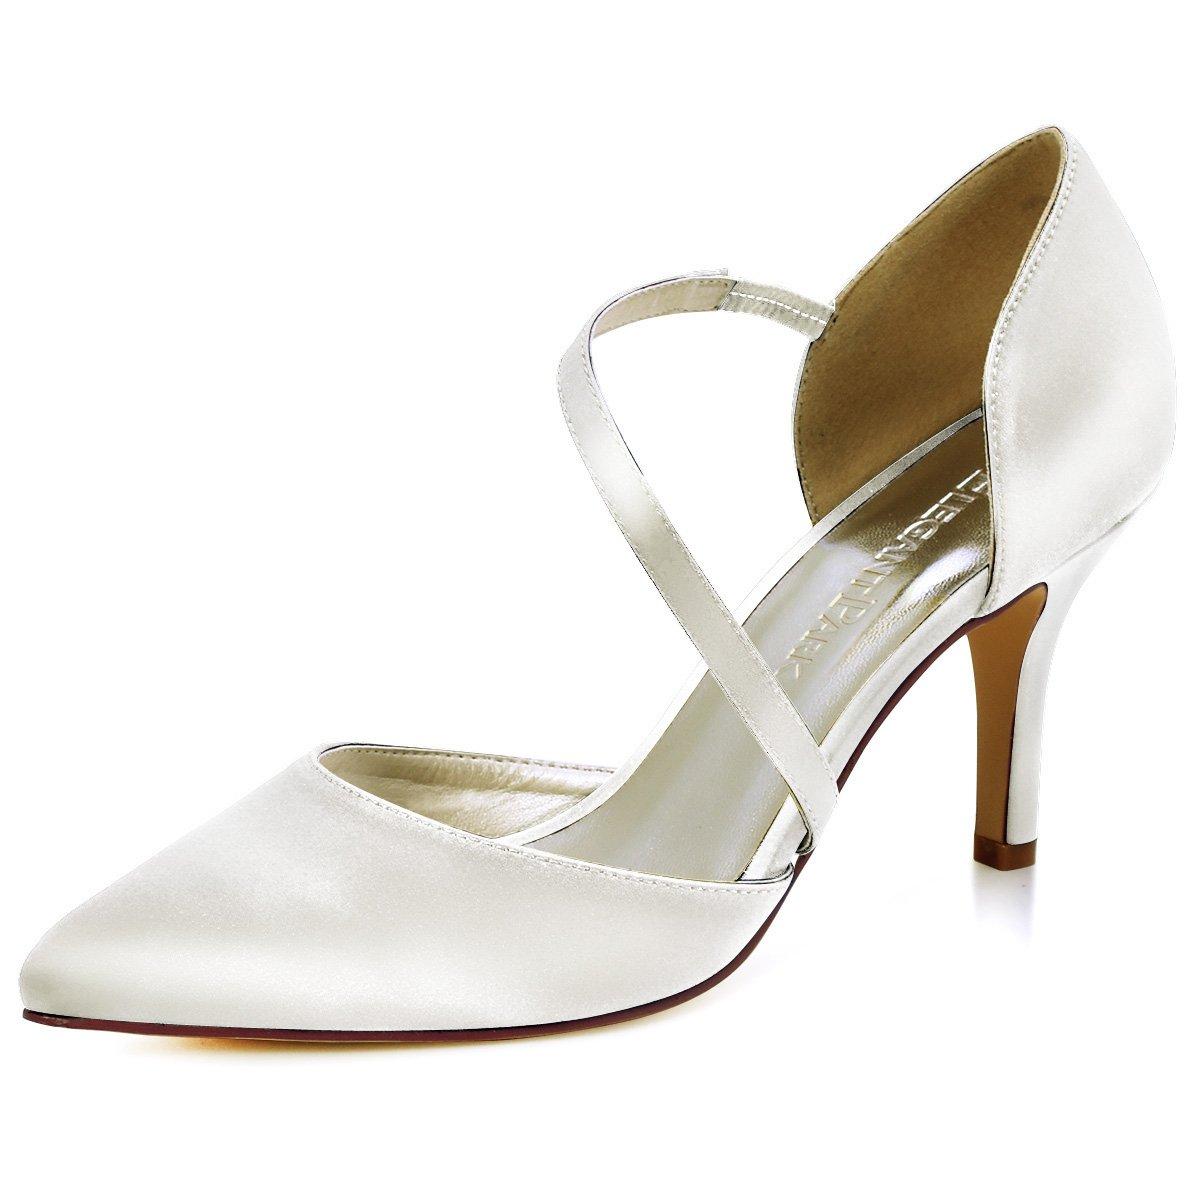 ElegantPark HC1711 Women High Heel Strappy Dress Pumps Pointy Toe Satin Wedding Party Shoes Ivory US 8.5